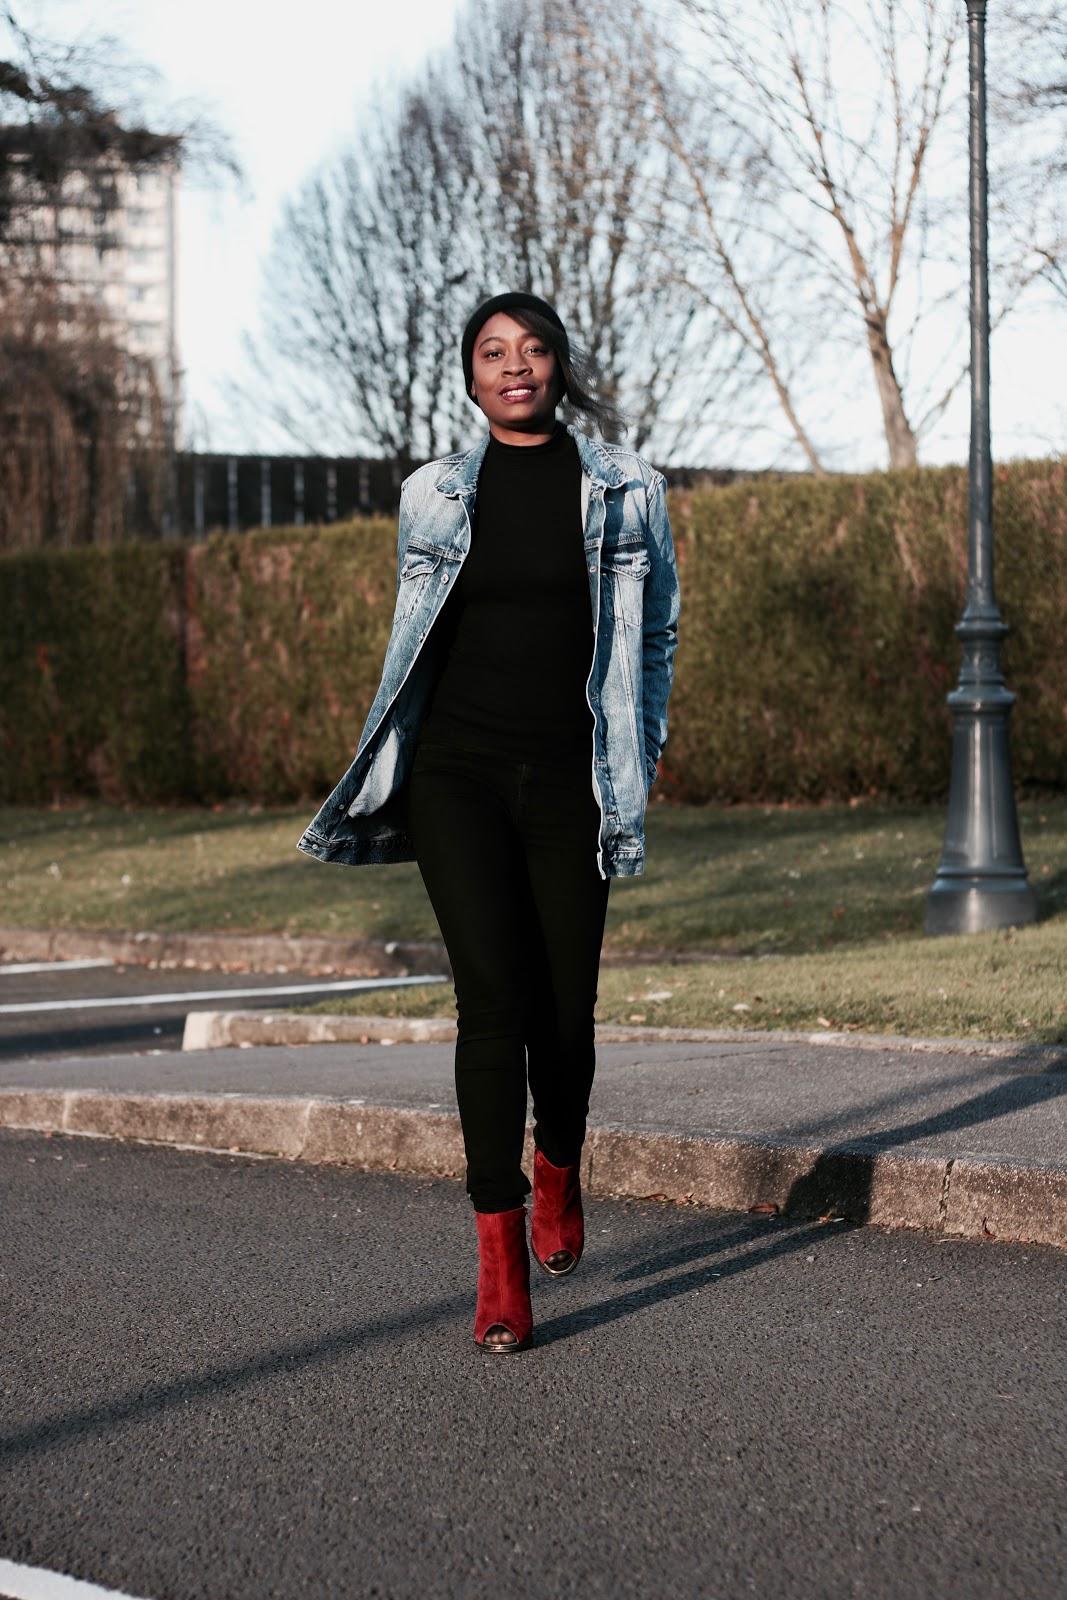 veste-en-jeans-blog-mode-tendance